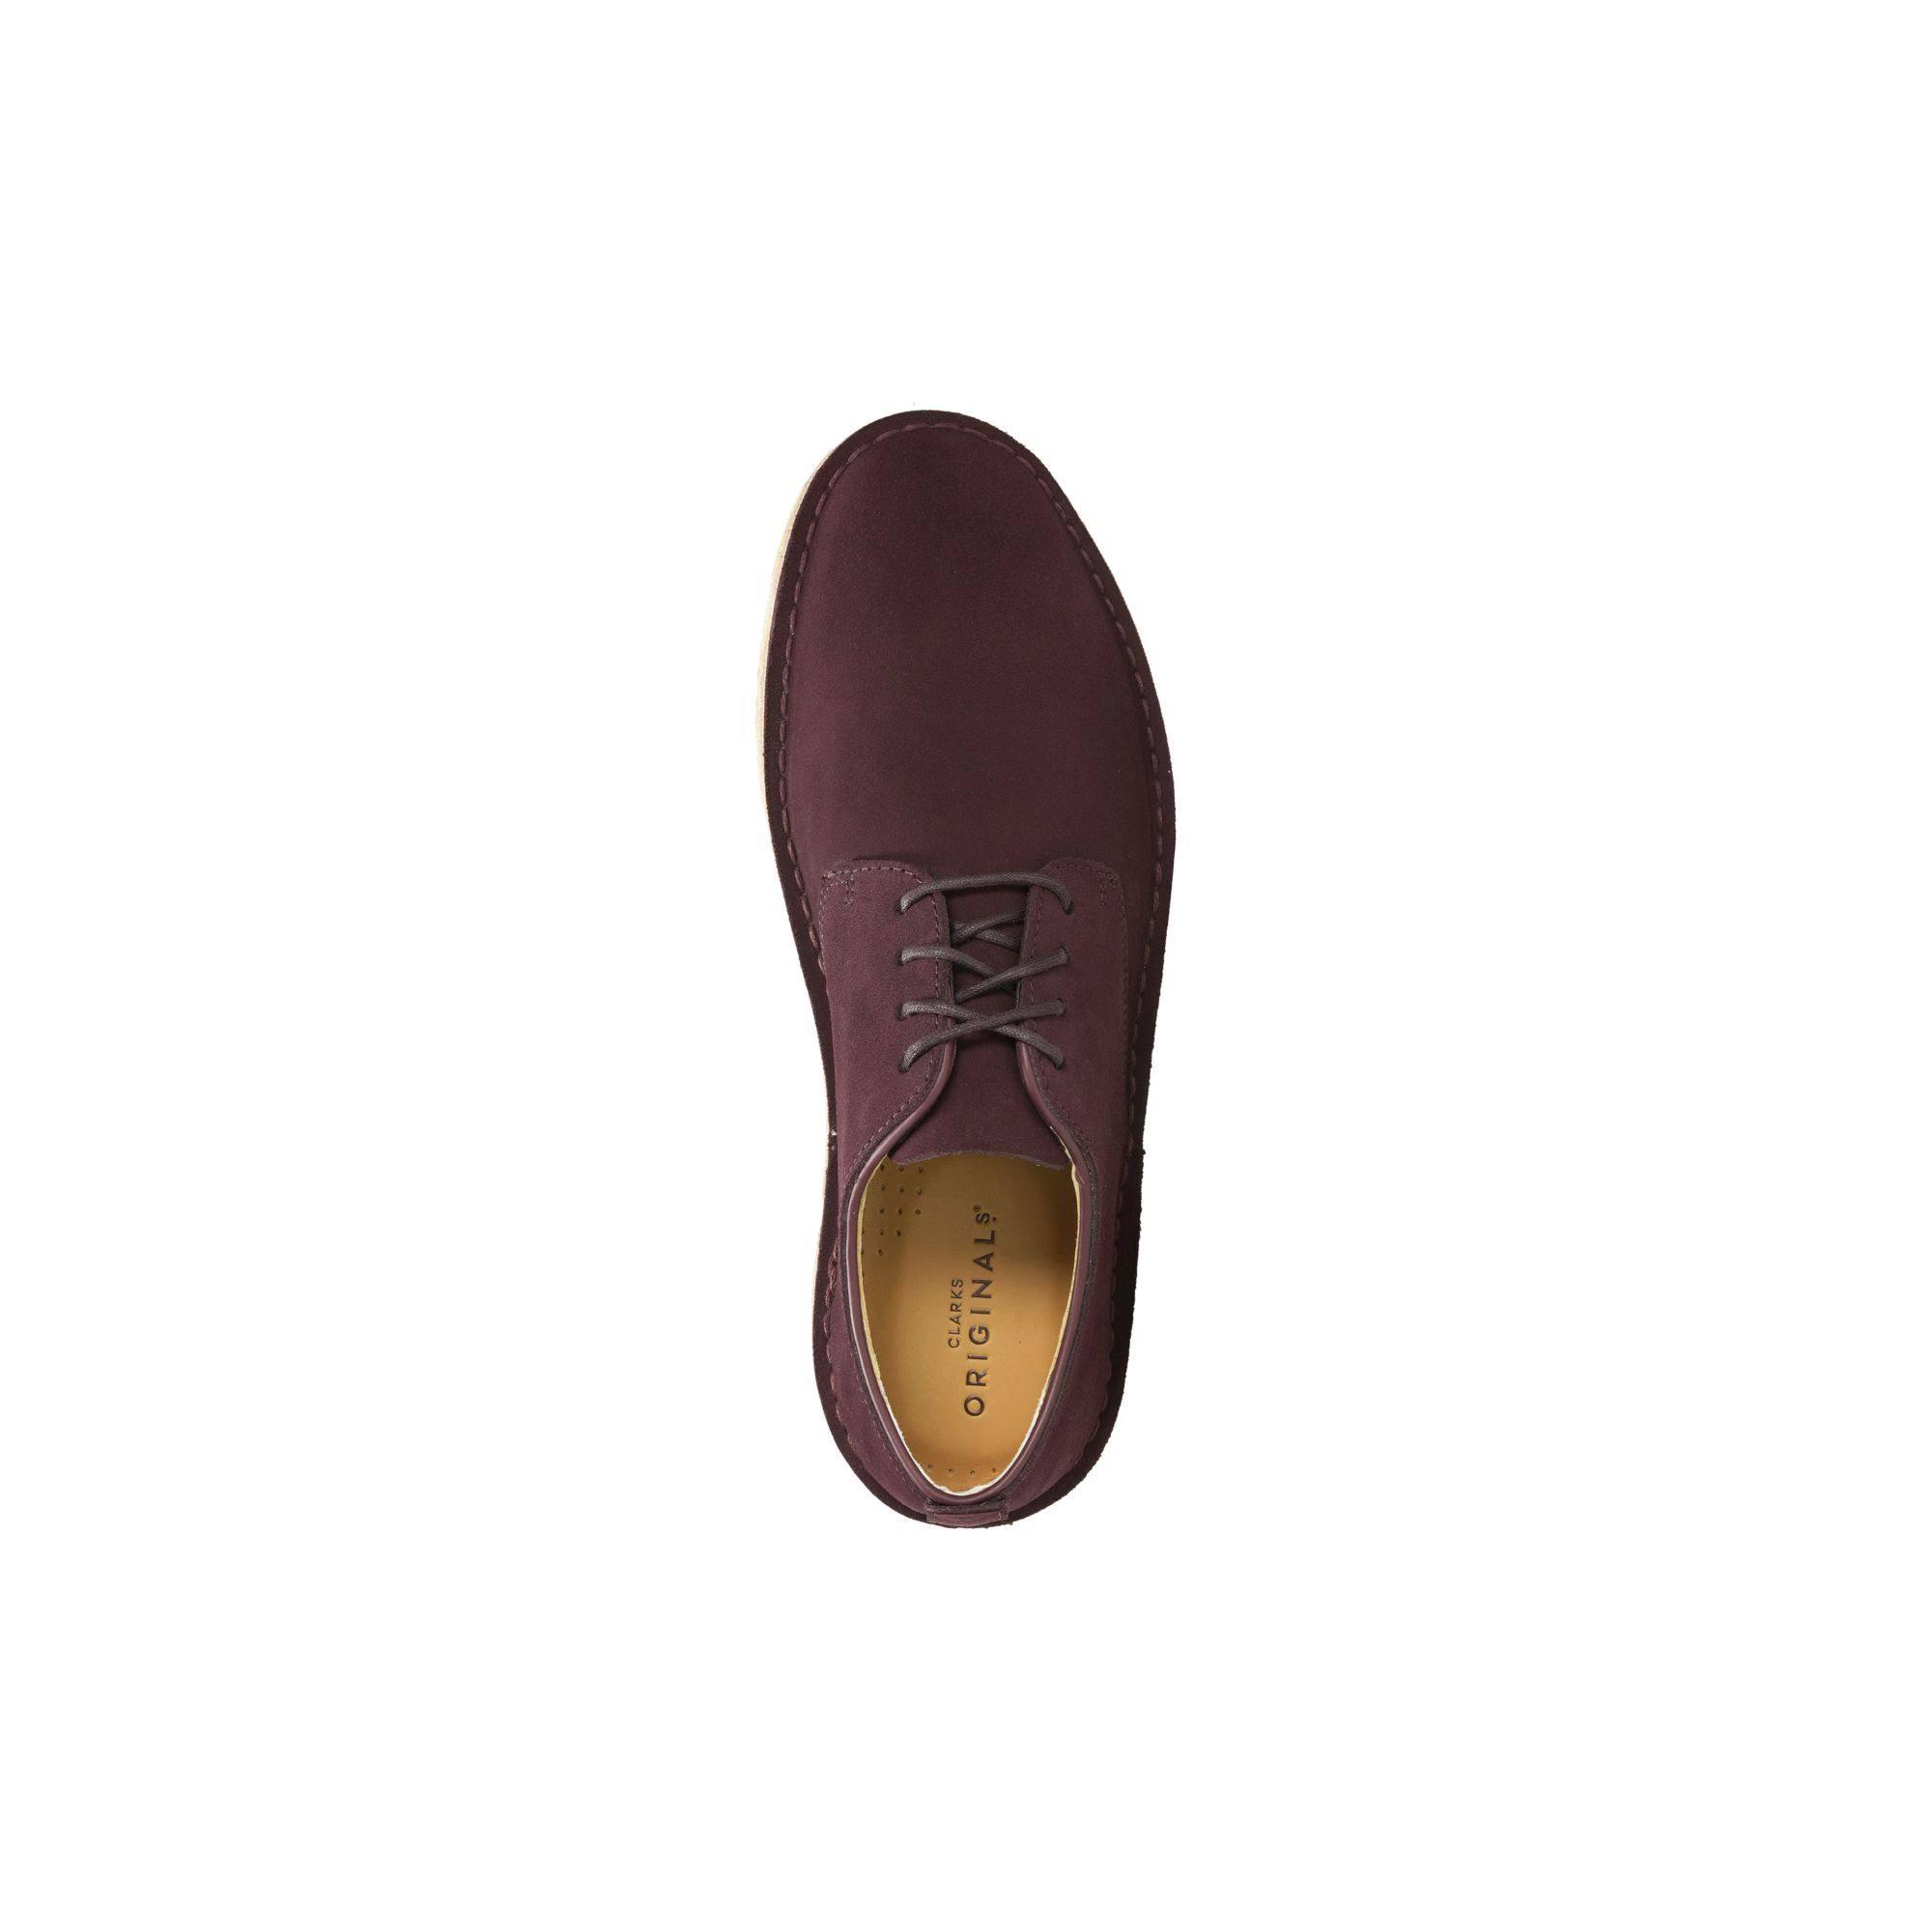 261285117 46 London Weinrot Schuhe Größe Desert Clarks qxZzv88